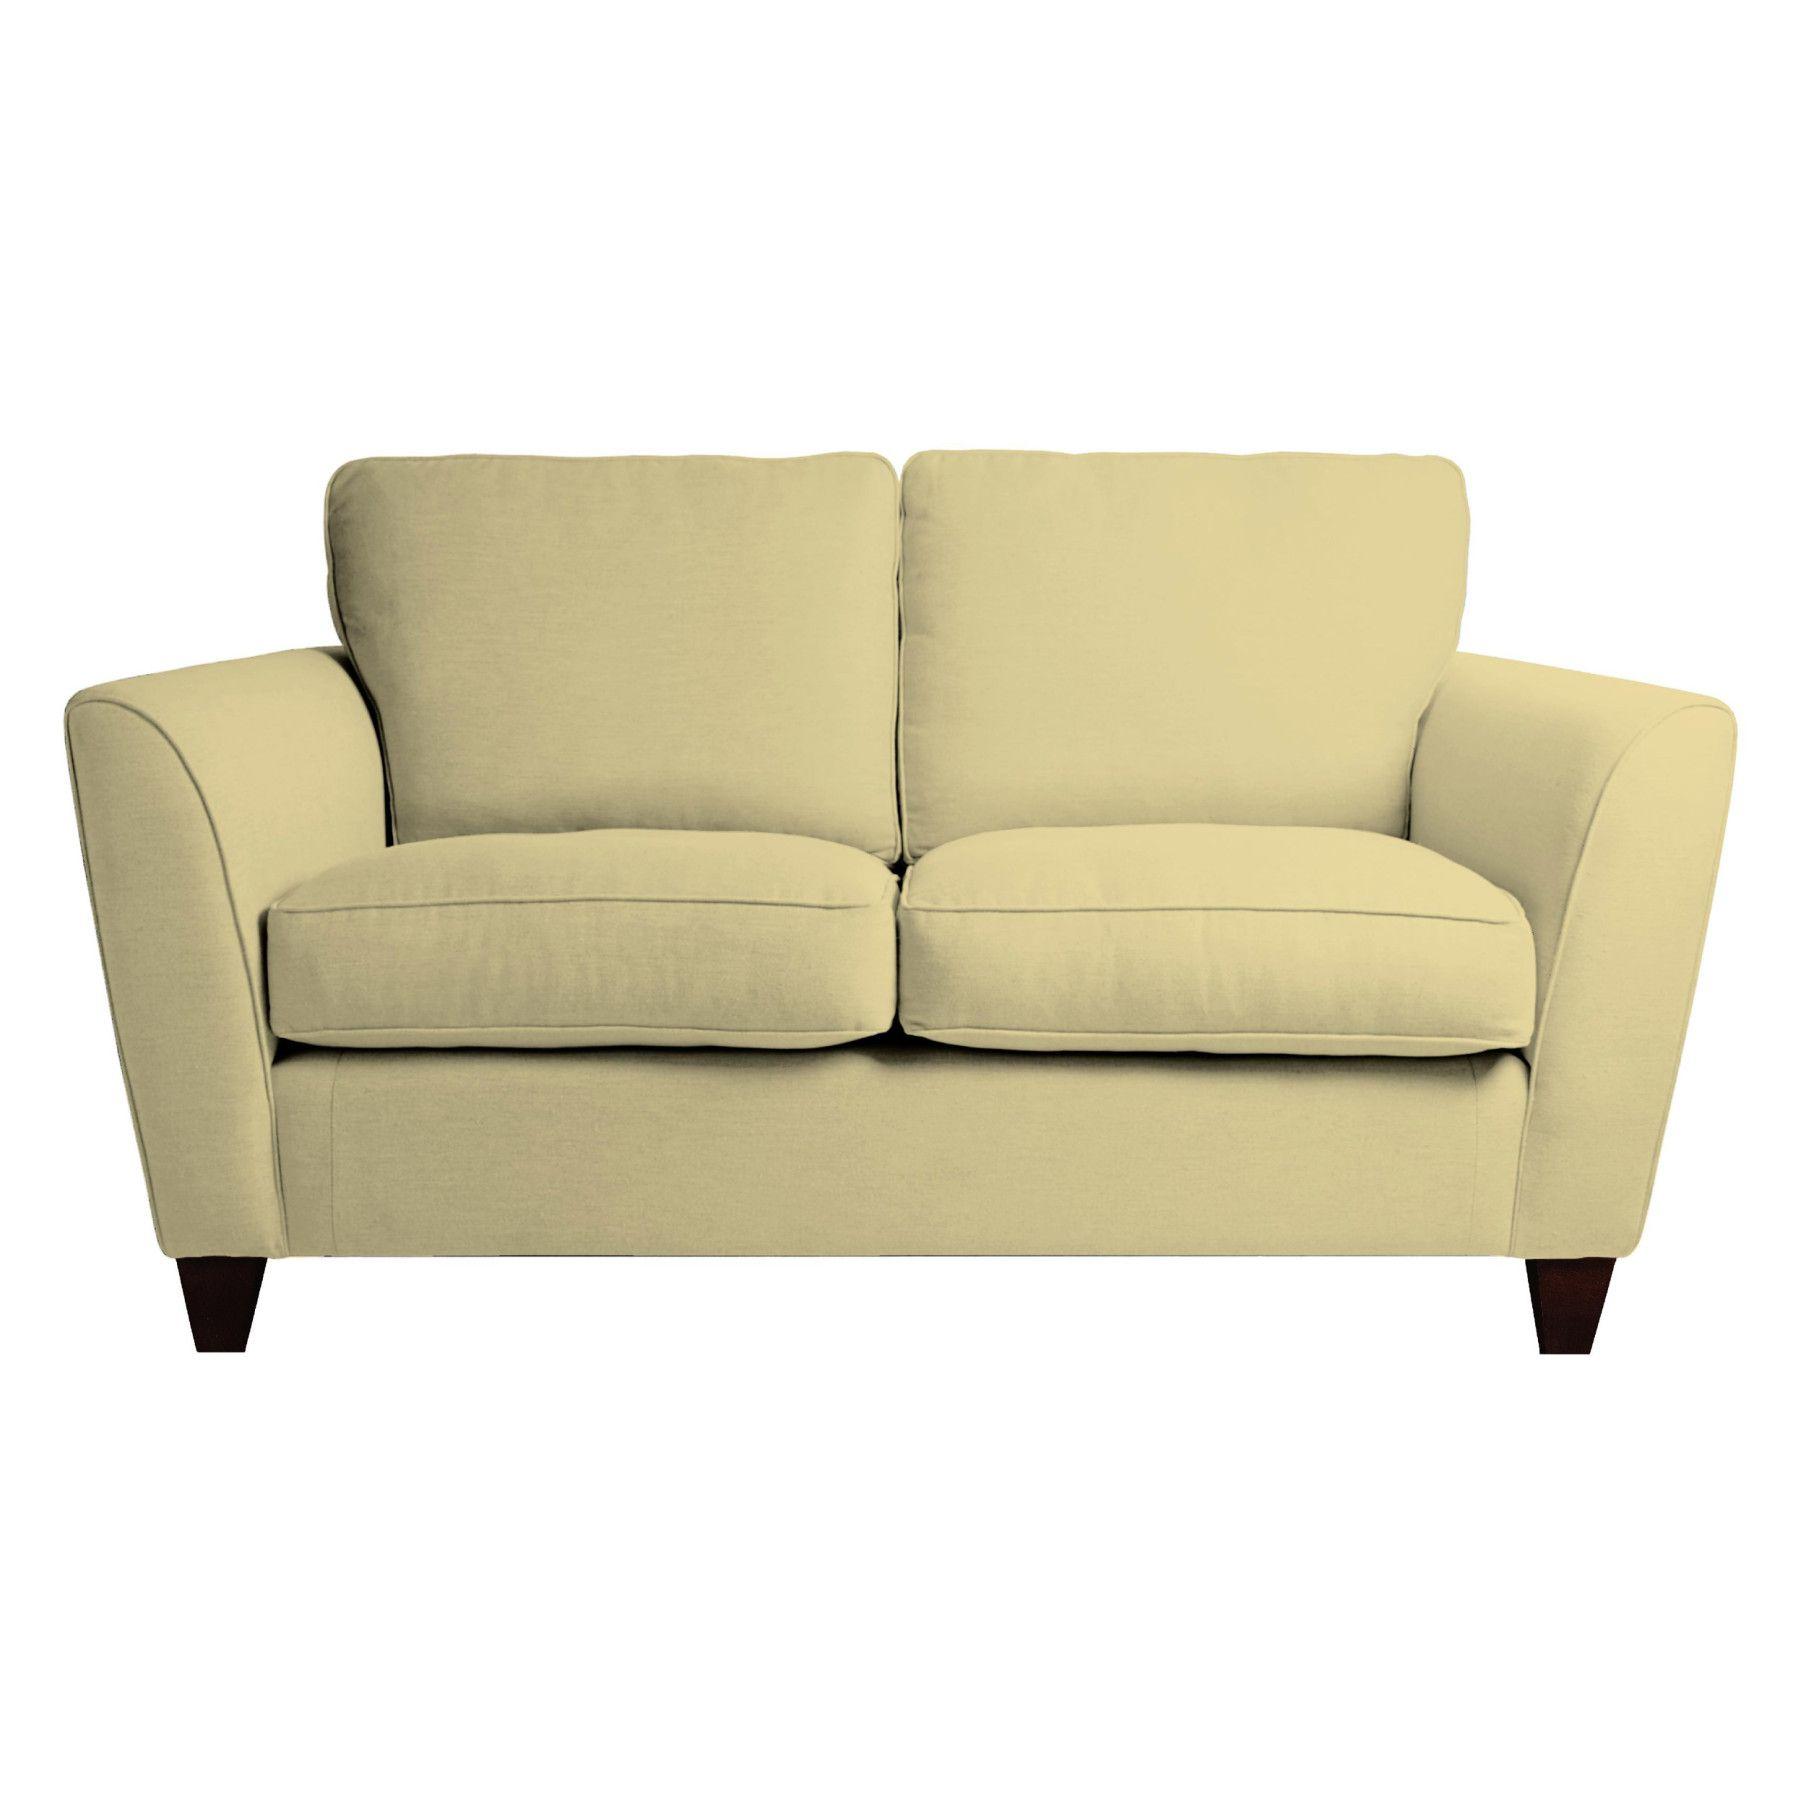 Made To Order Sofas Ashton Fabric 2 Seater Sofa In Eloise Pale Camomile Laura Ashley